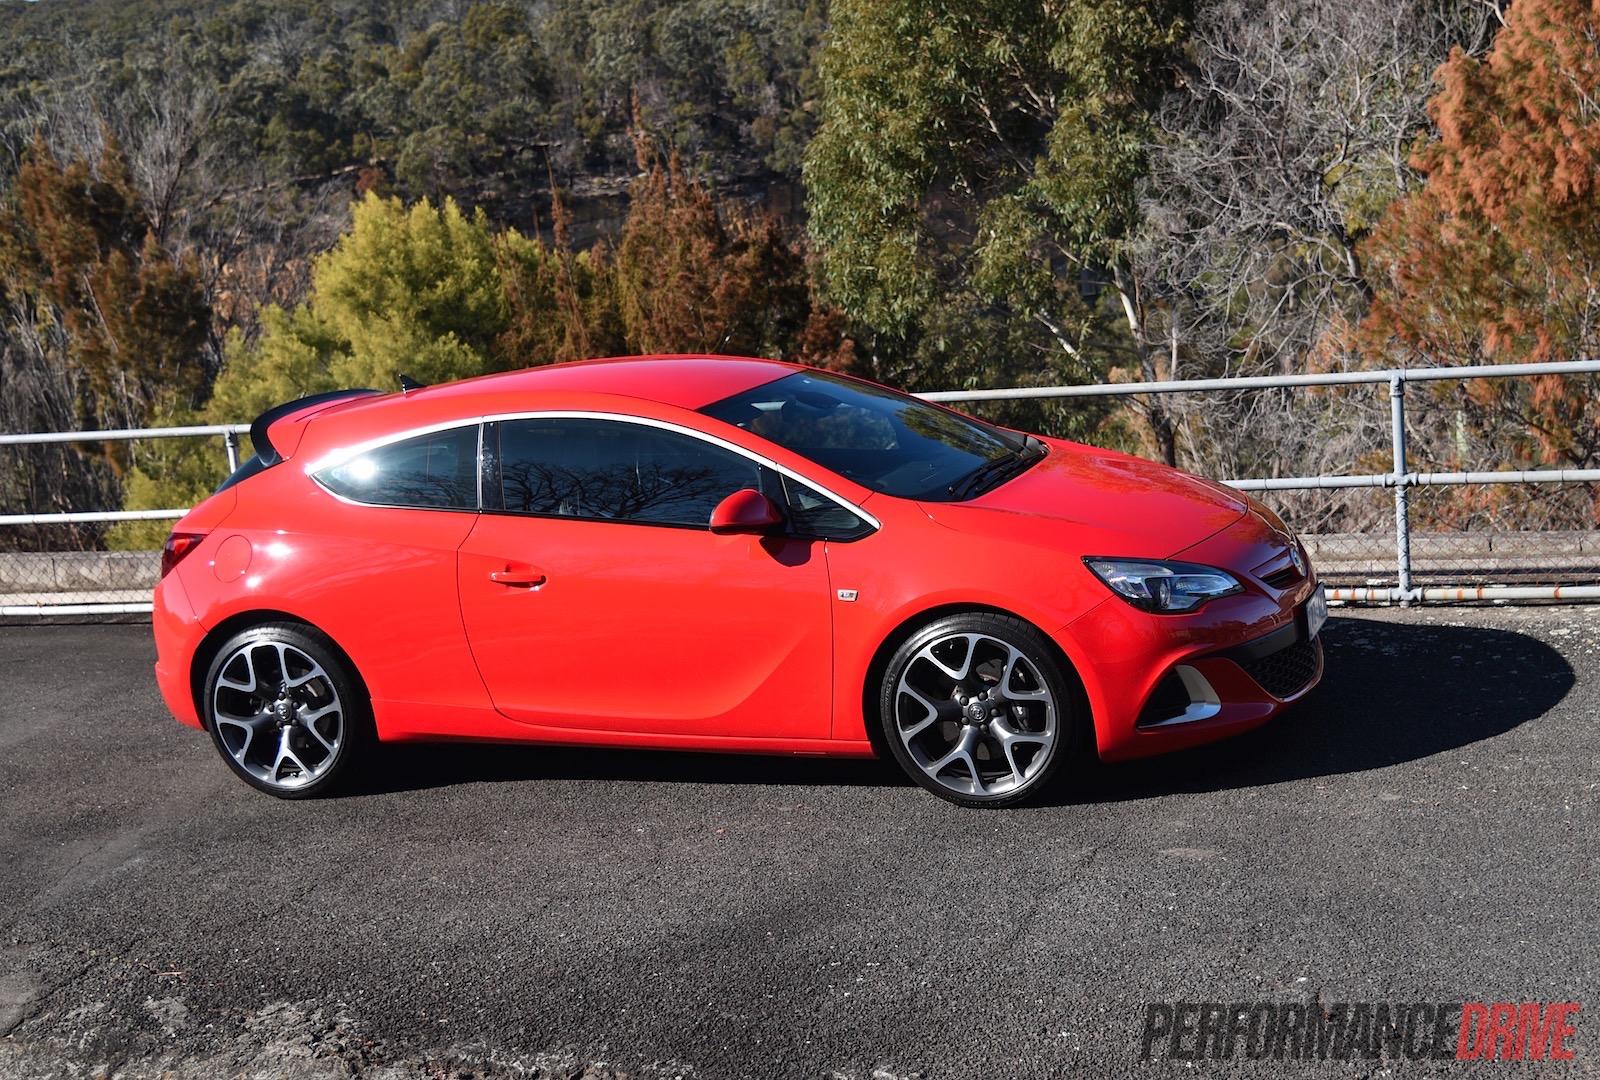 2015 Holden Astra VXR review (video) | PerformanceDrive